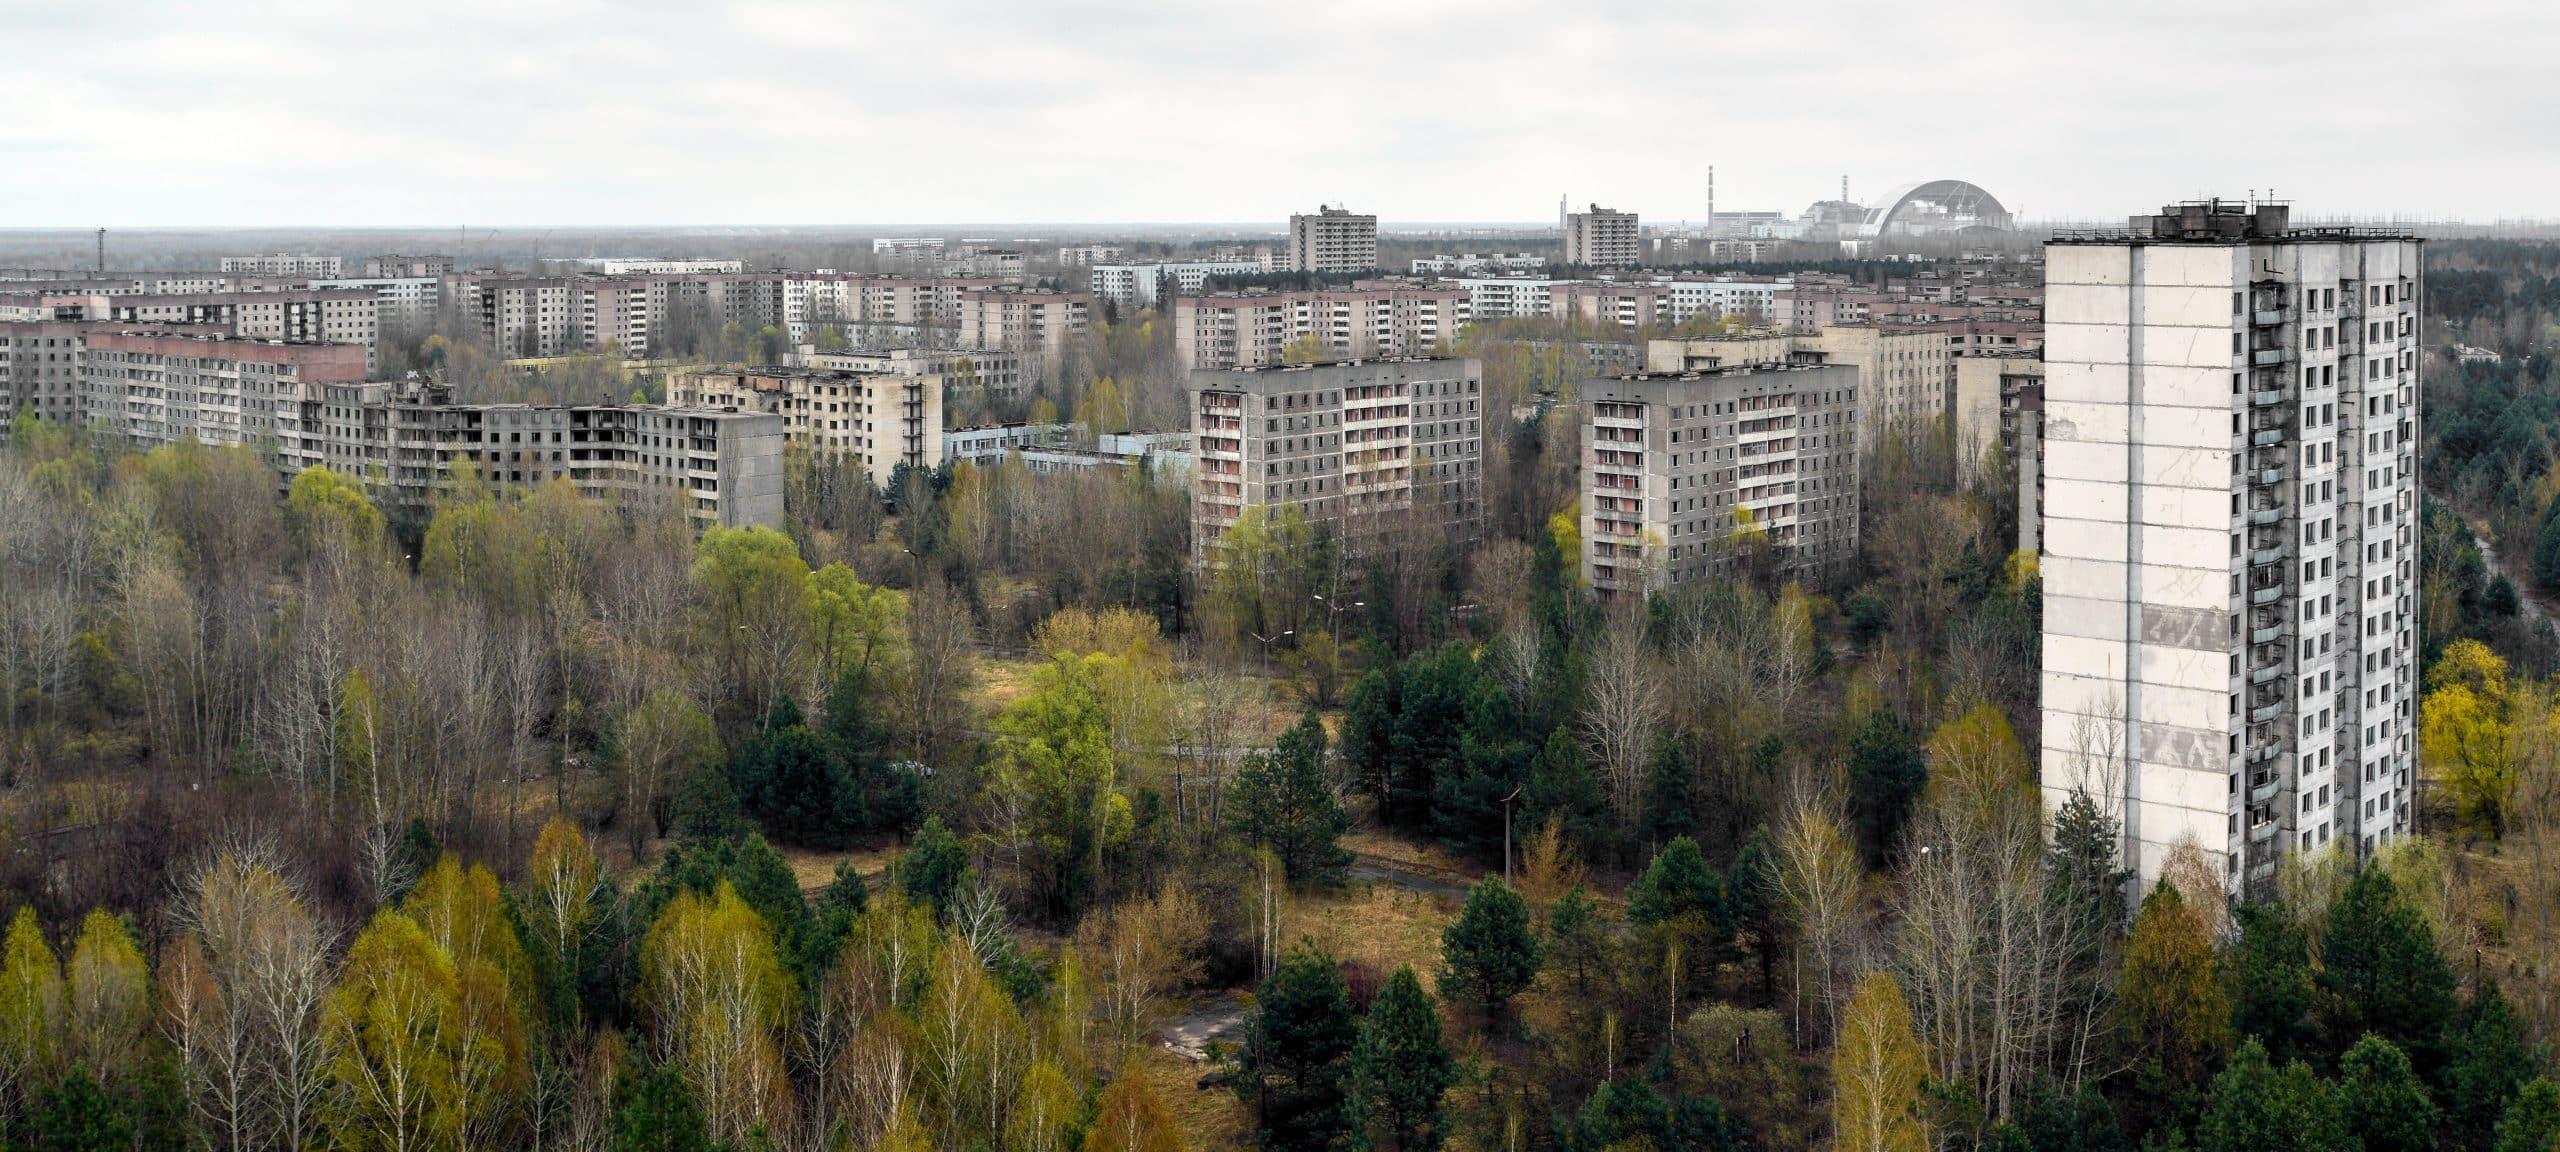 Chernobyl 35 years later